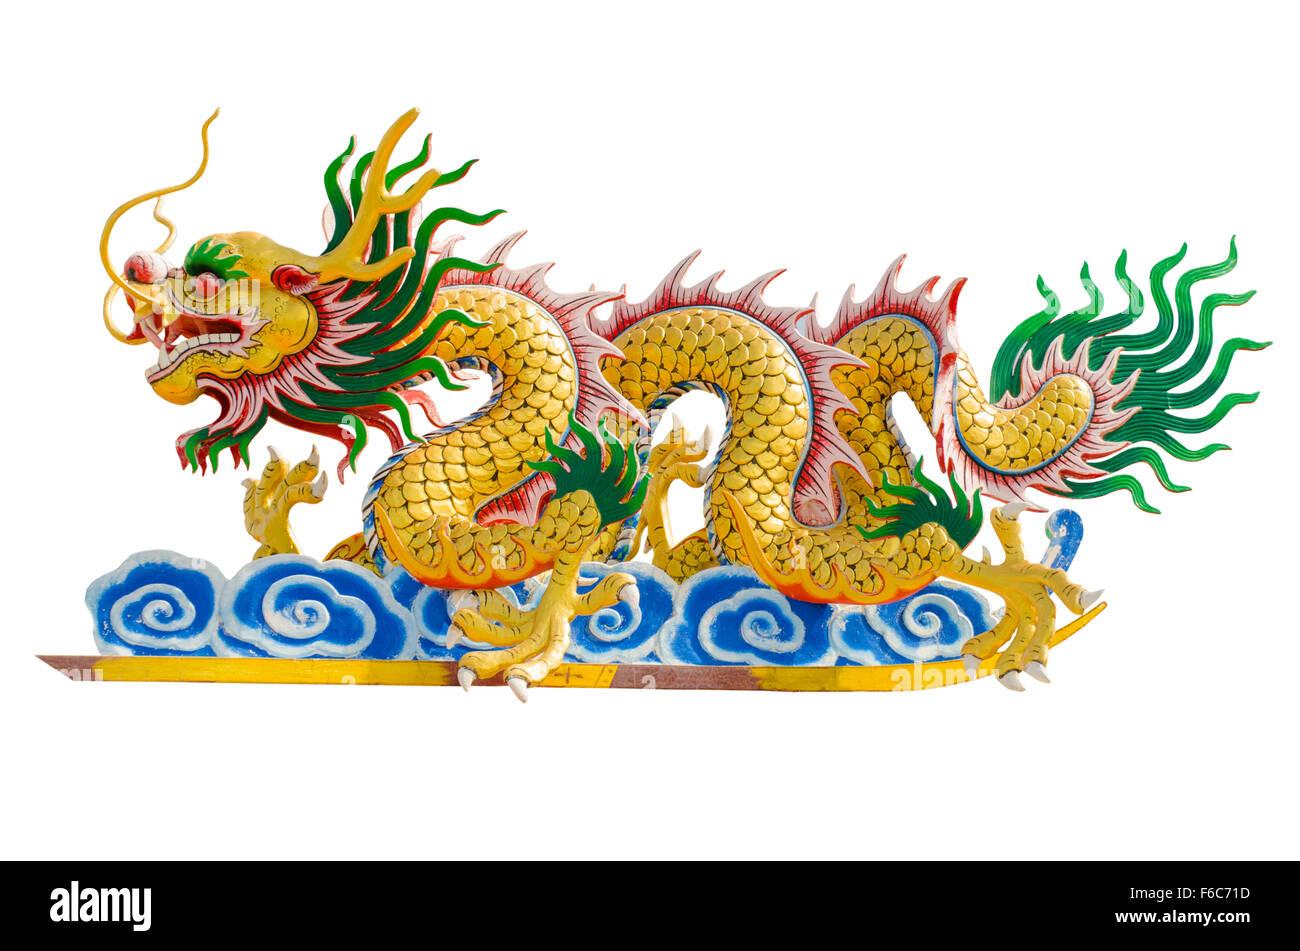 Image dragon chinois sur fonds blancs. Photo Stock